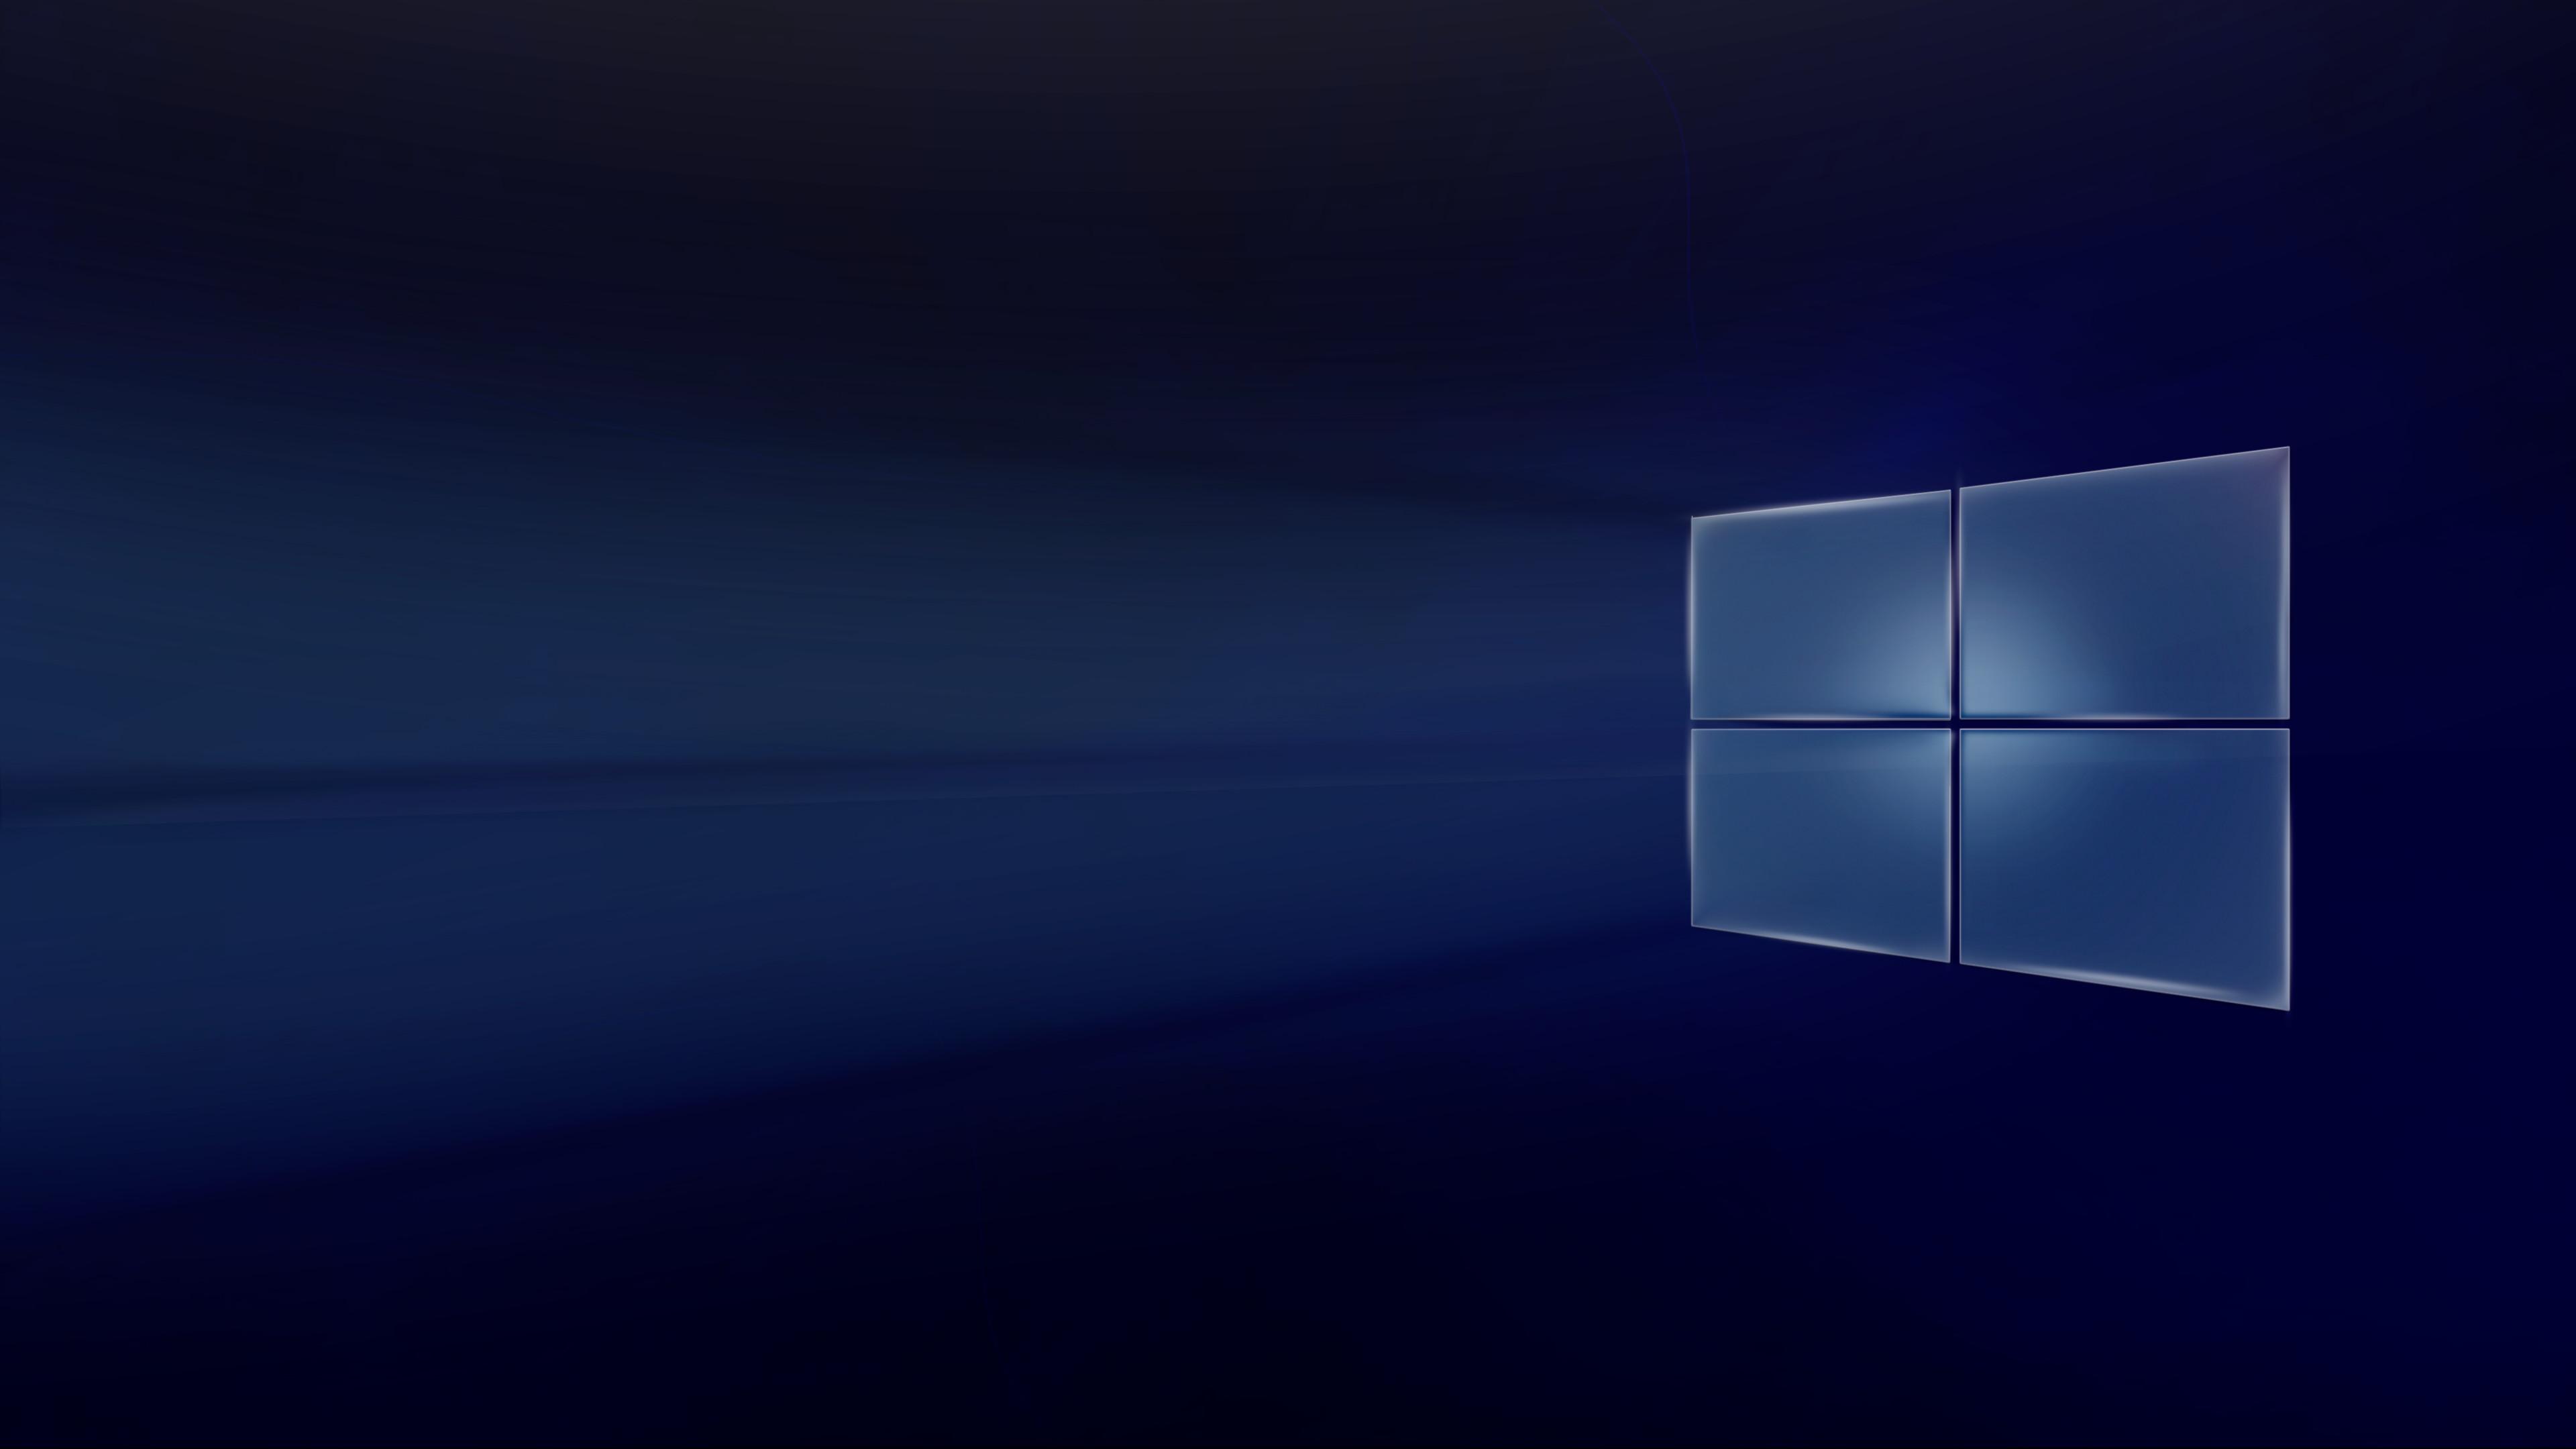 Res: 3840x2160, Windows 10 Vista(Glass)-Styled Hero wsallpaper by grisha22